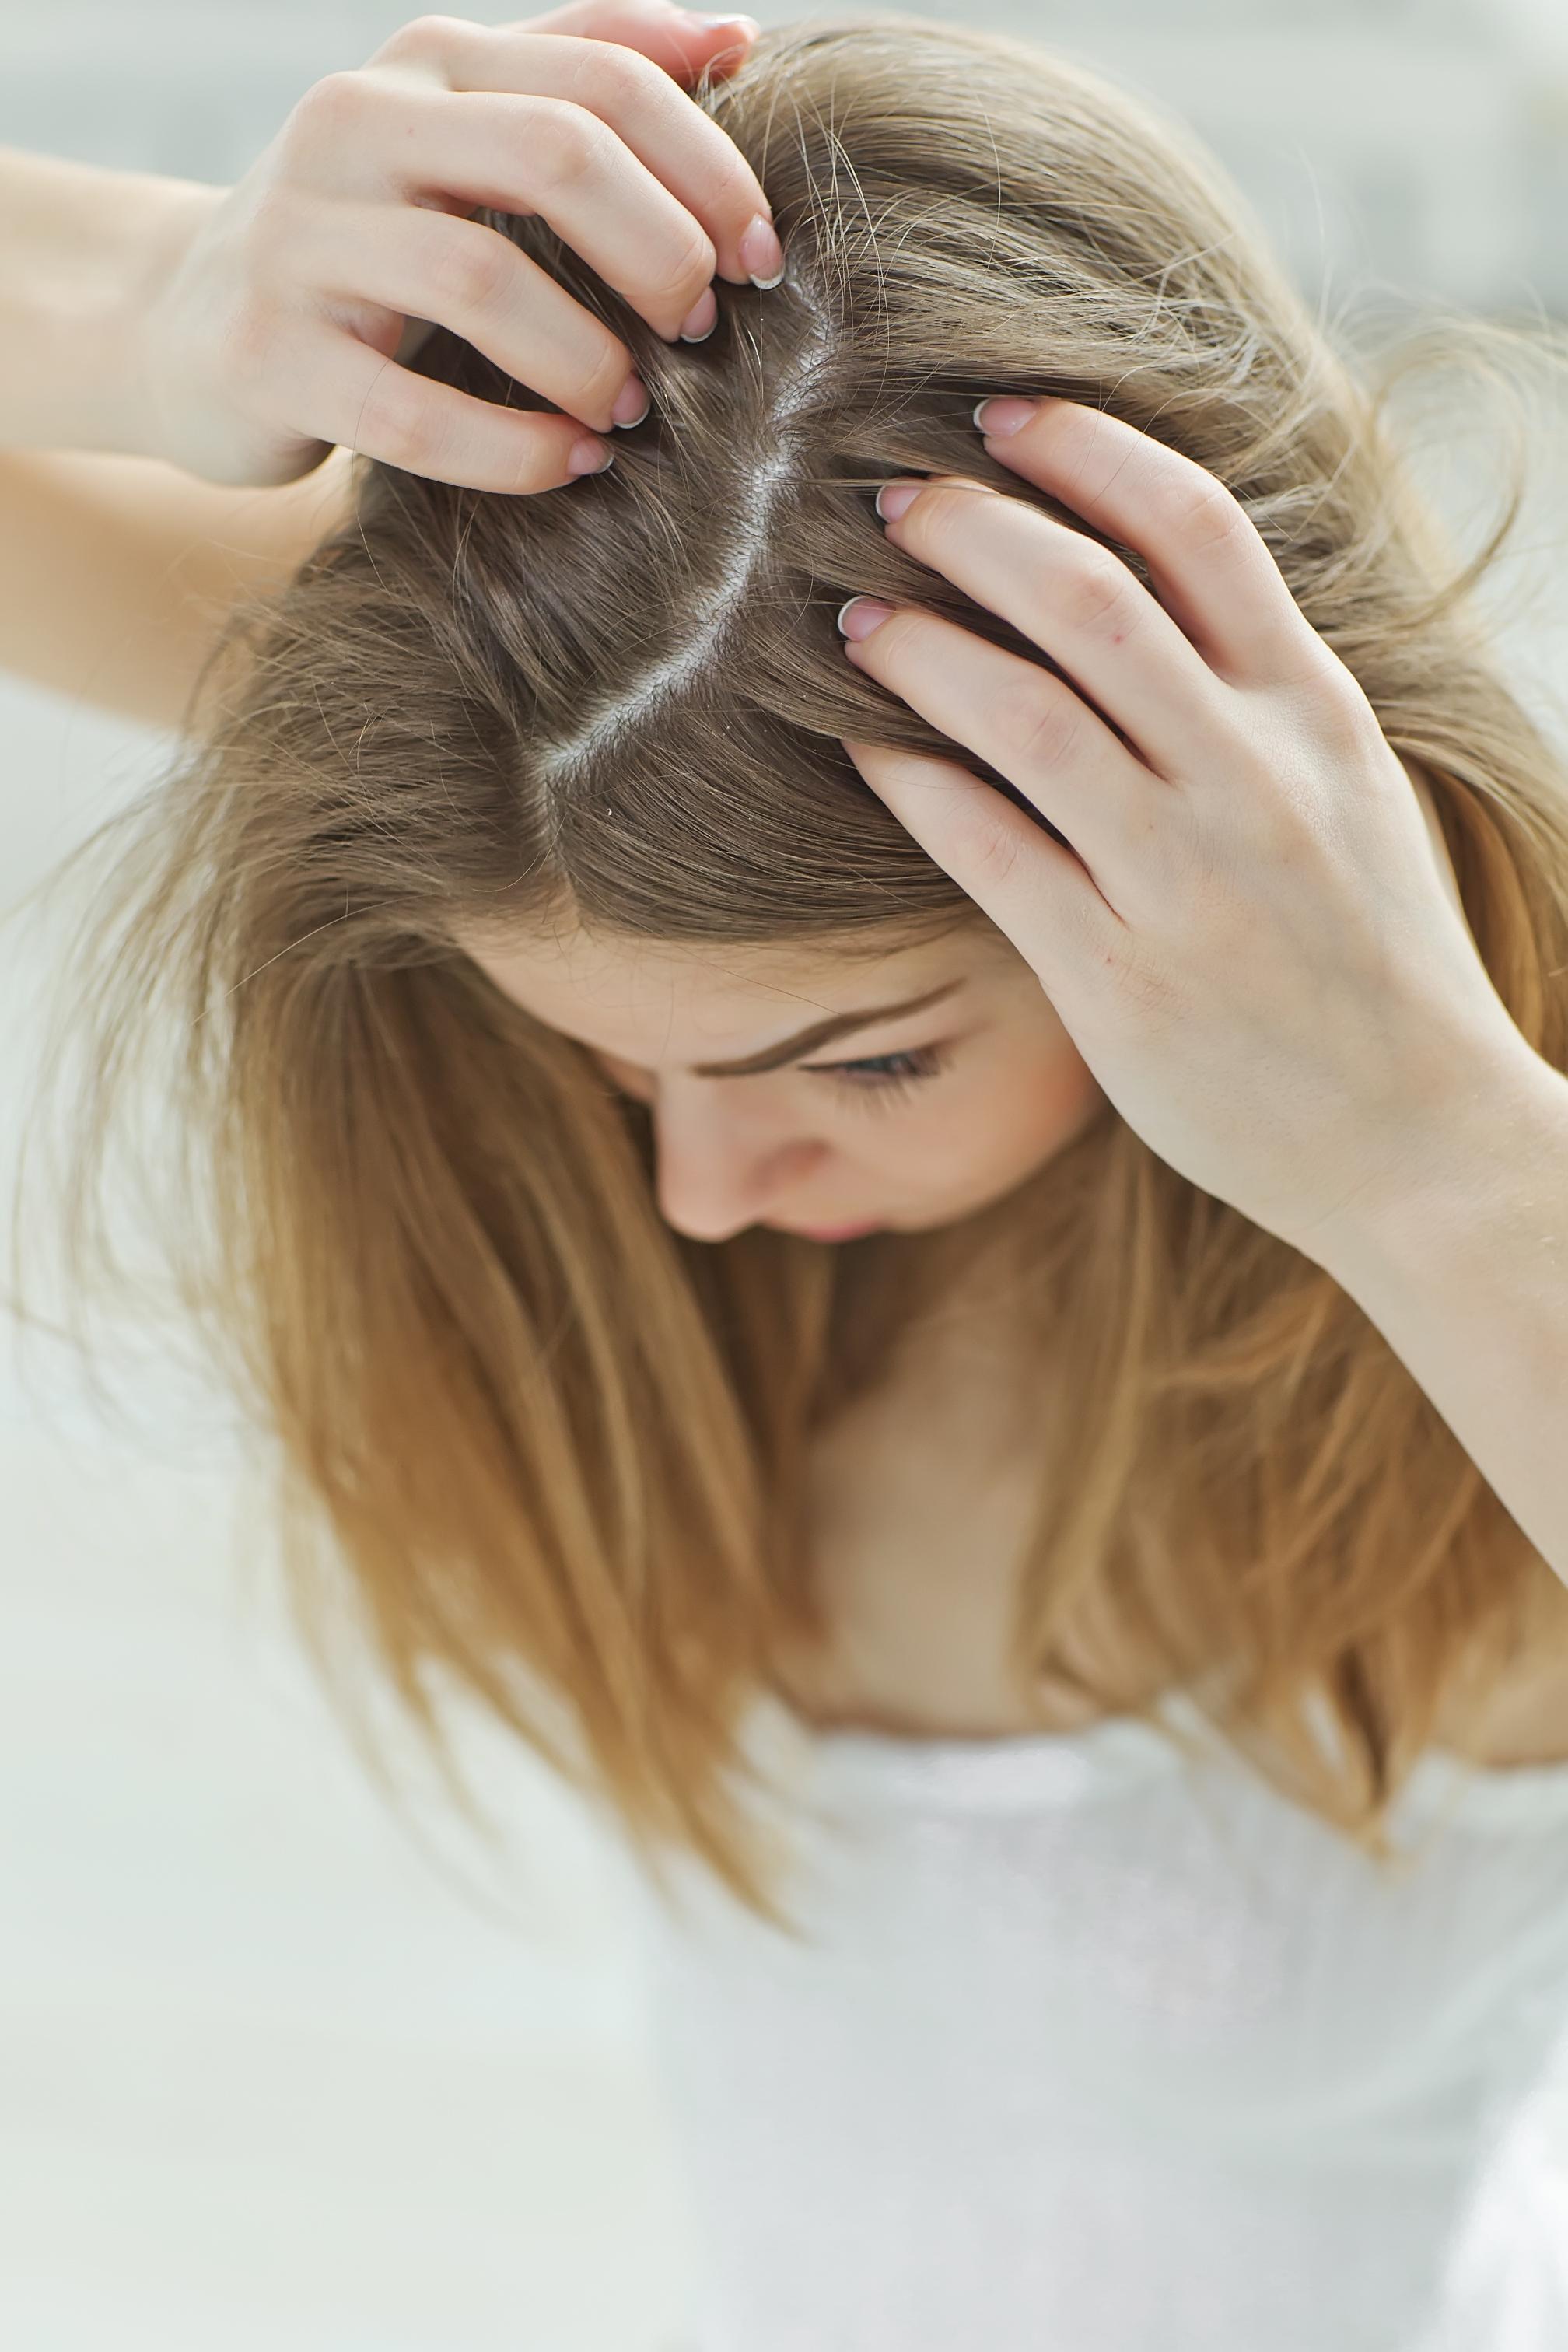 Soft Scalp Lump Symptoms, Causes & Common Questions | Buoy